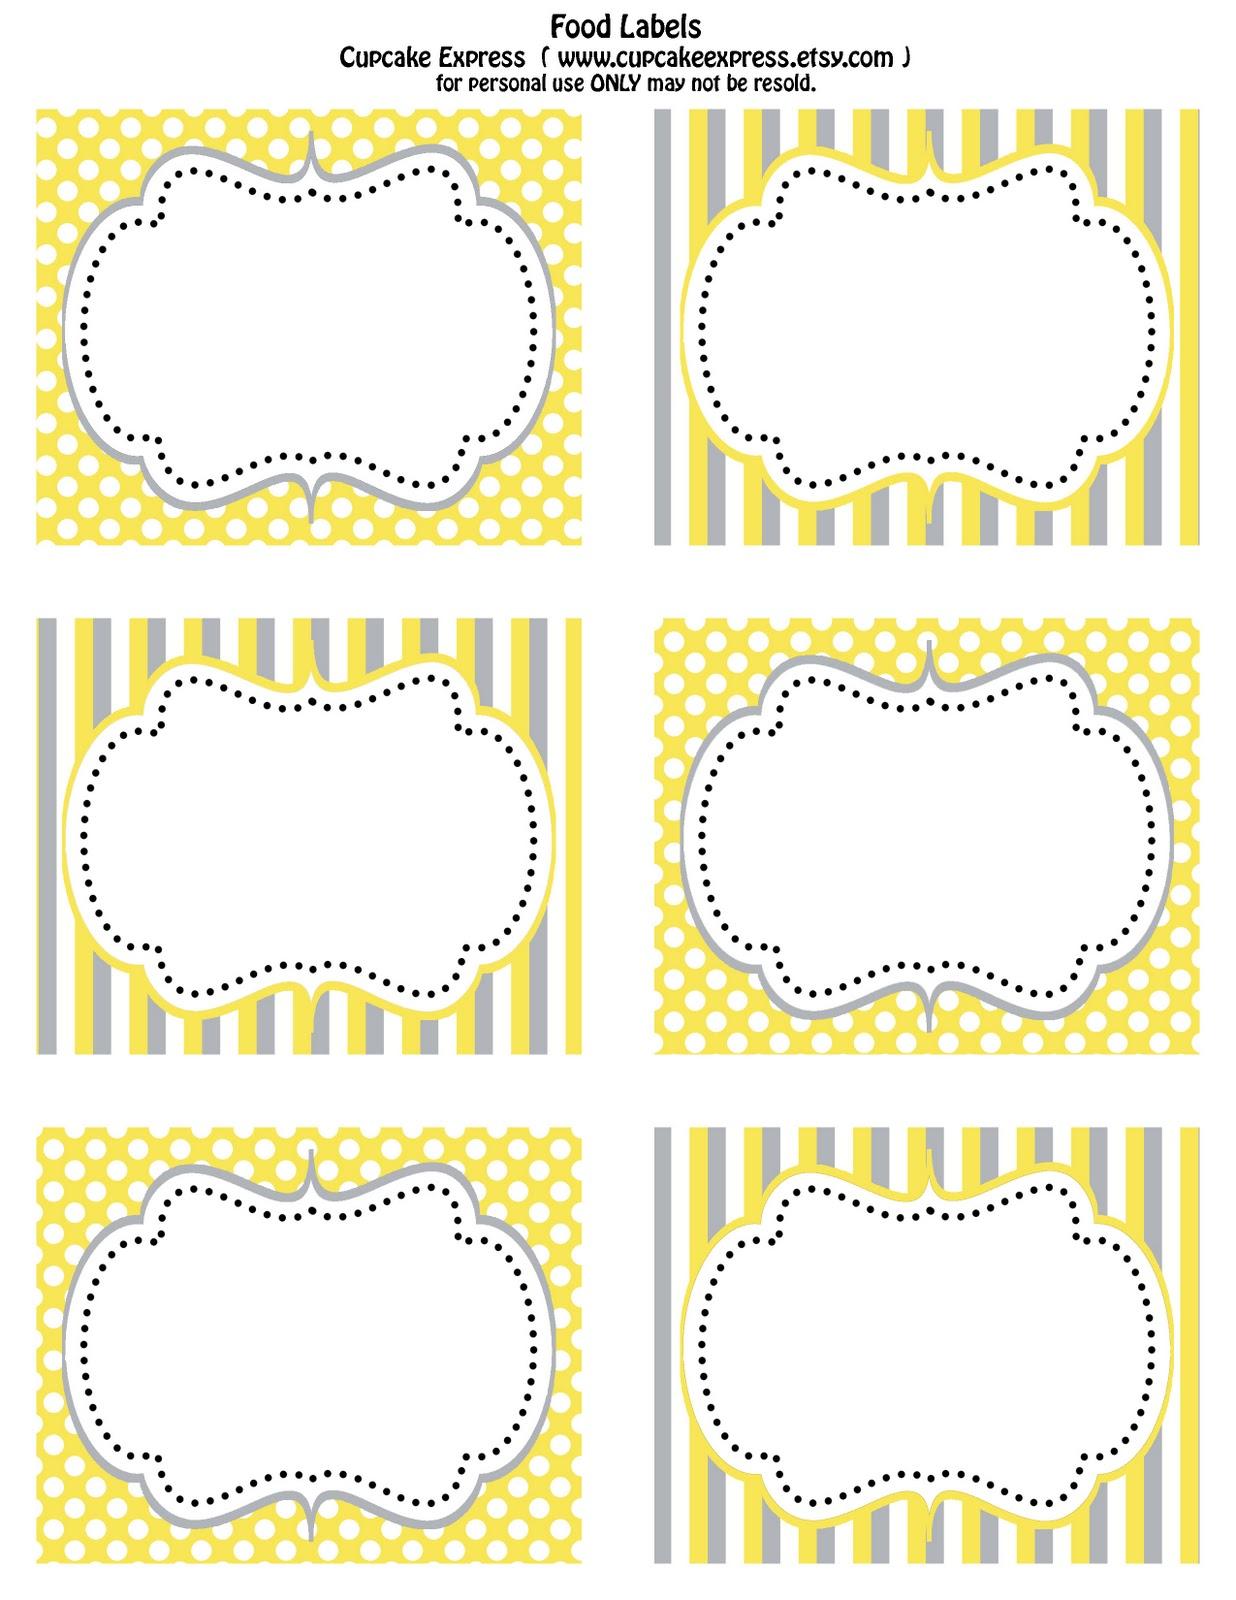 Cupcake Express Free Printable Yellow And Grey Food